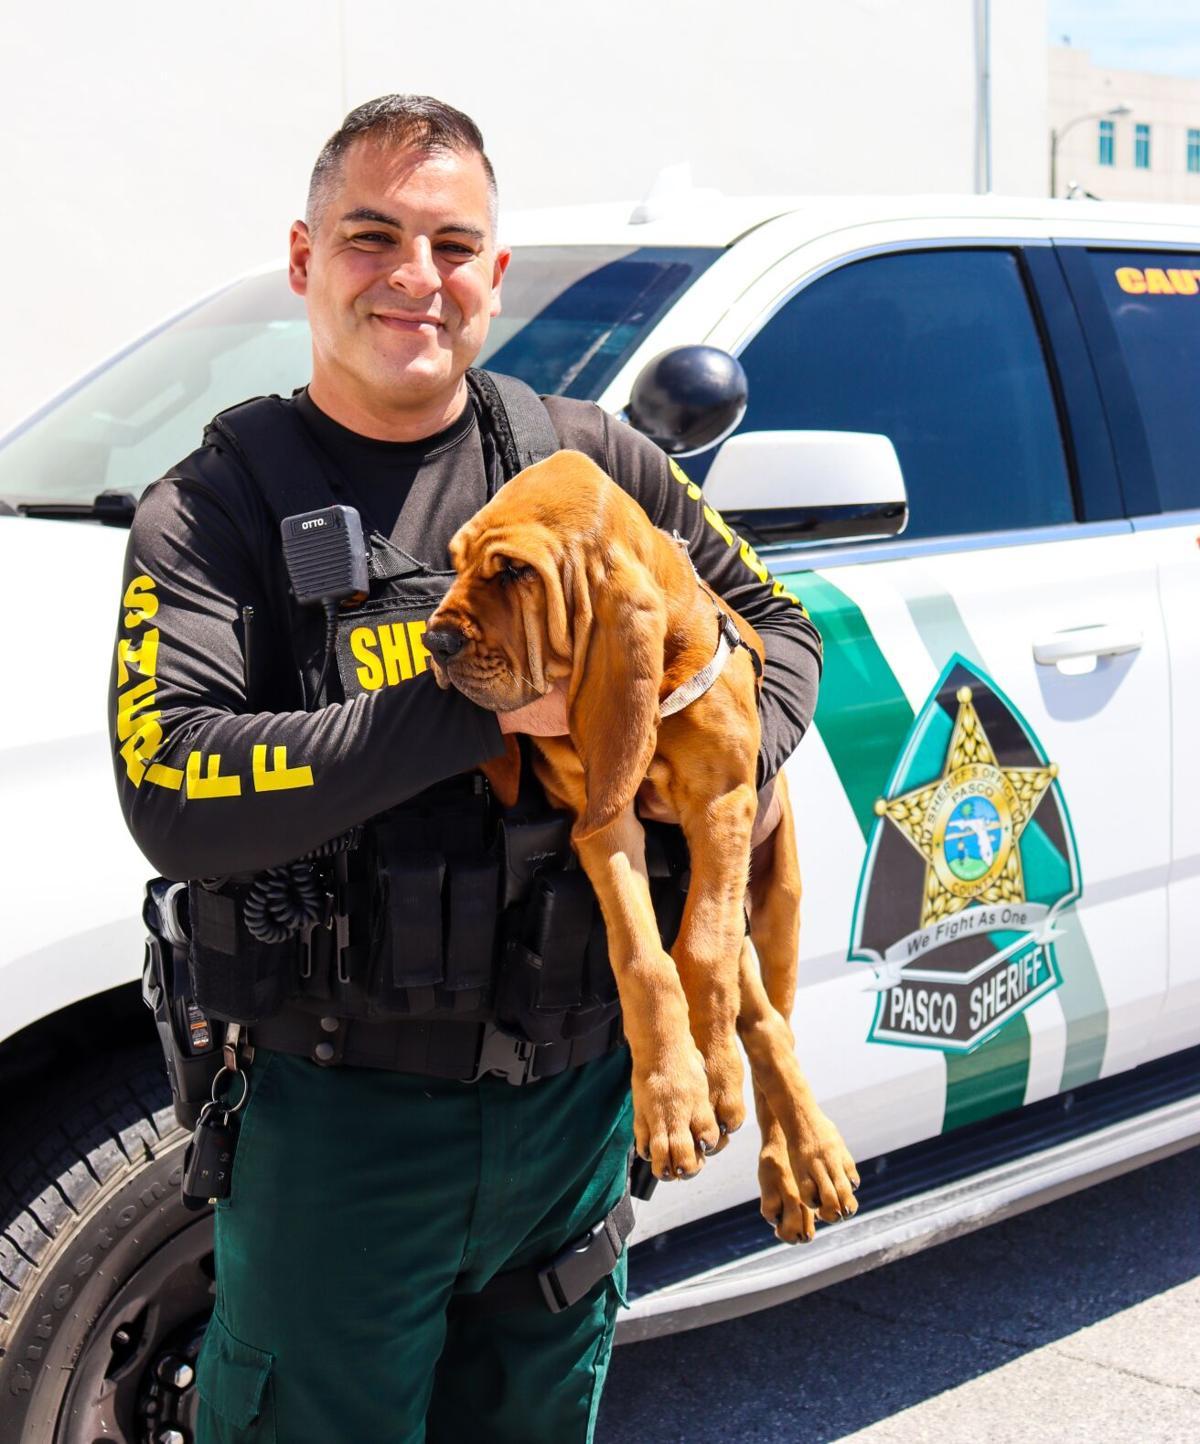 PA0505 BloodhoundGang HERNANDEZ-SHELBY.jpg